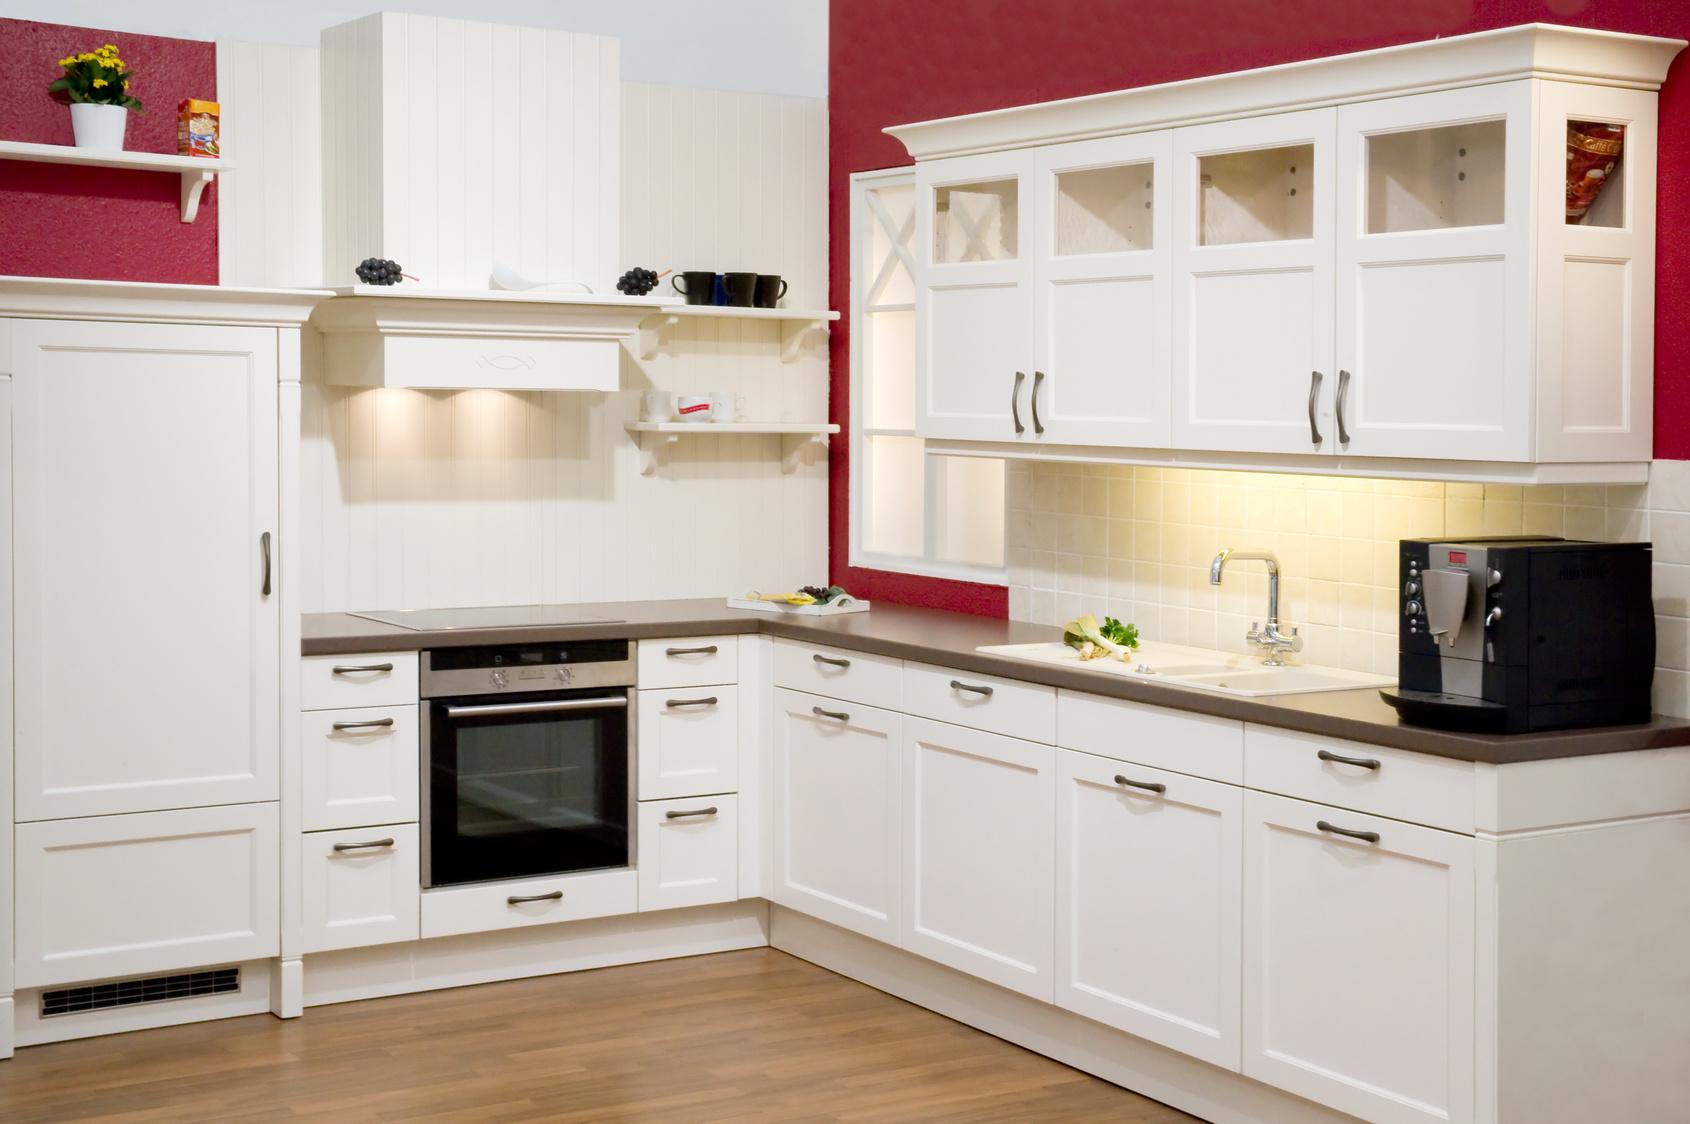 einbauk che pink. Black Bedroom Furniture Sets. Home Design Ideas